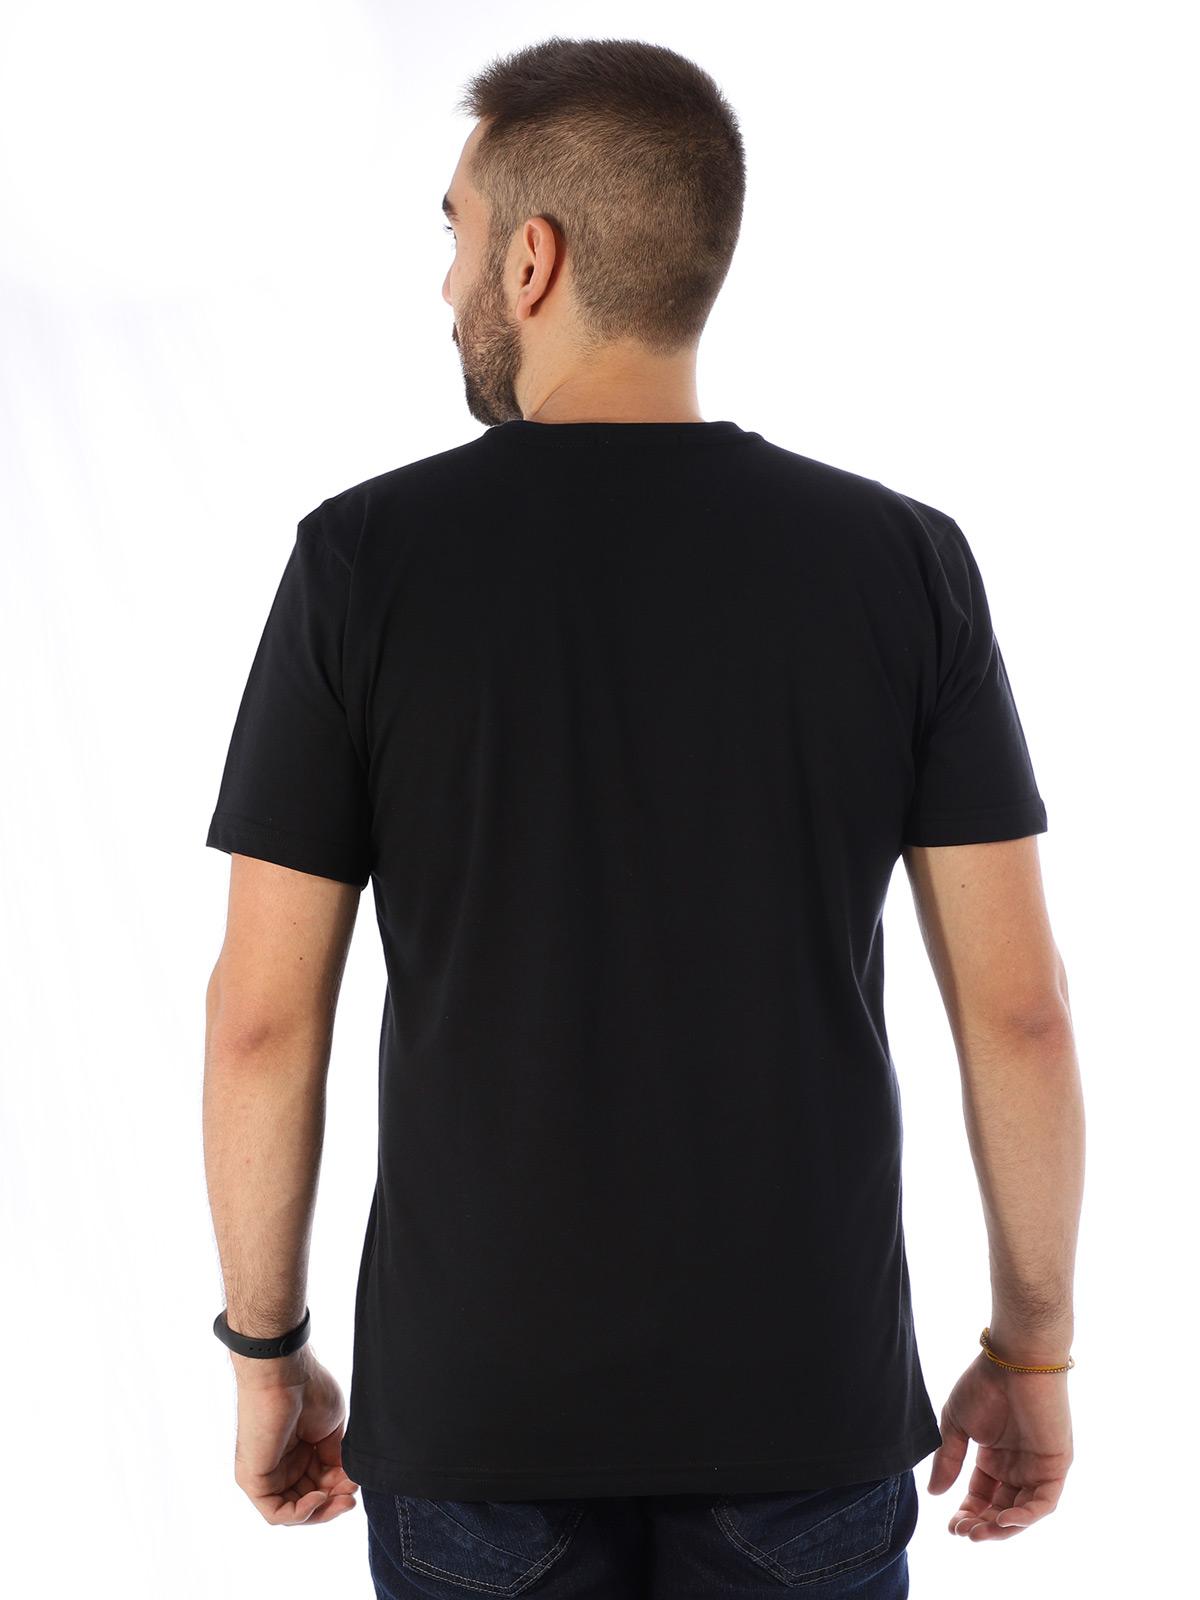 Camiseta Masculina Manga Curta Básica Devils Preto